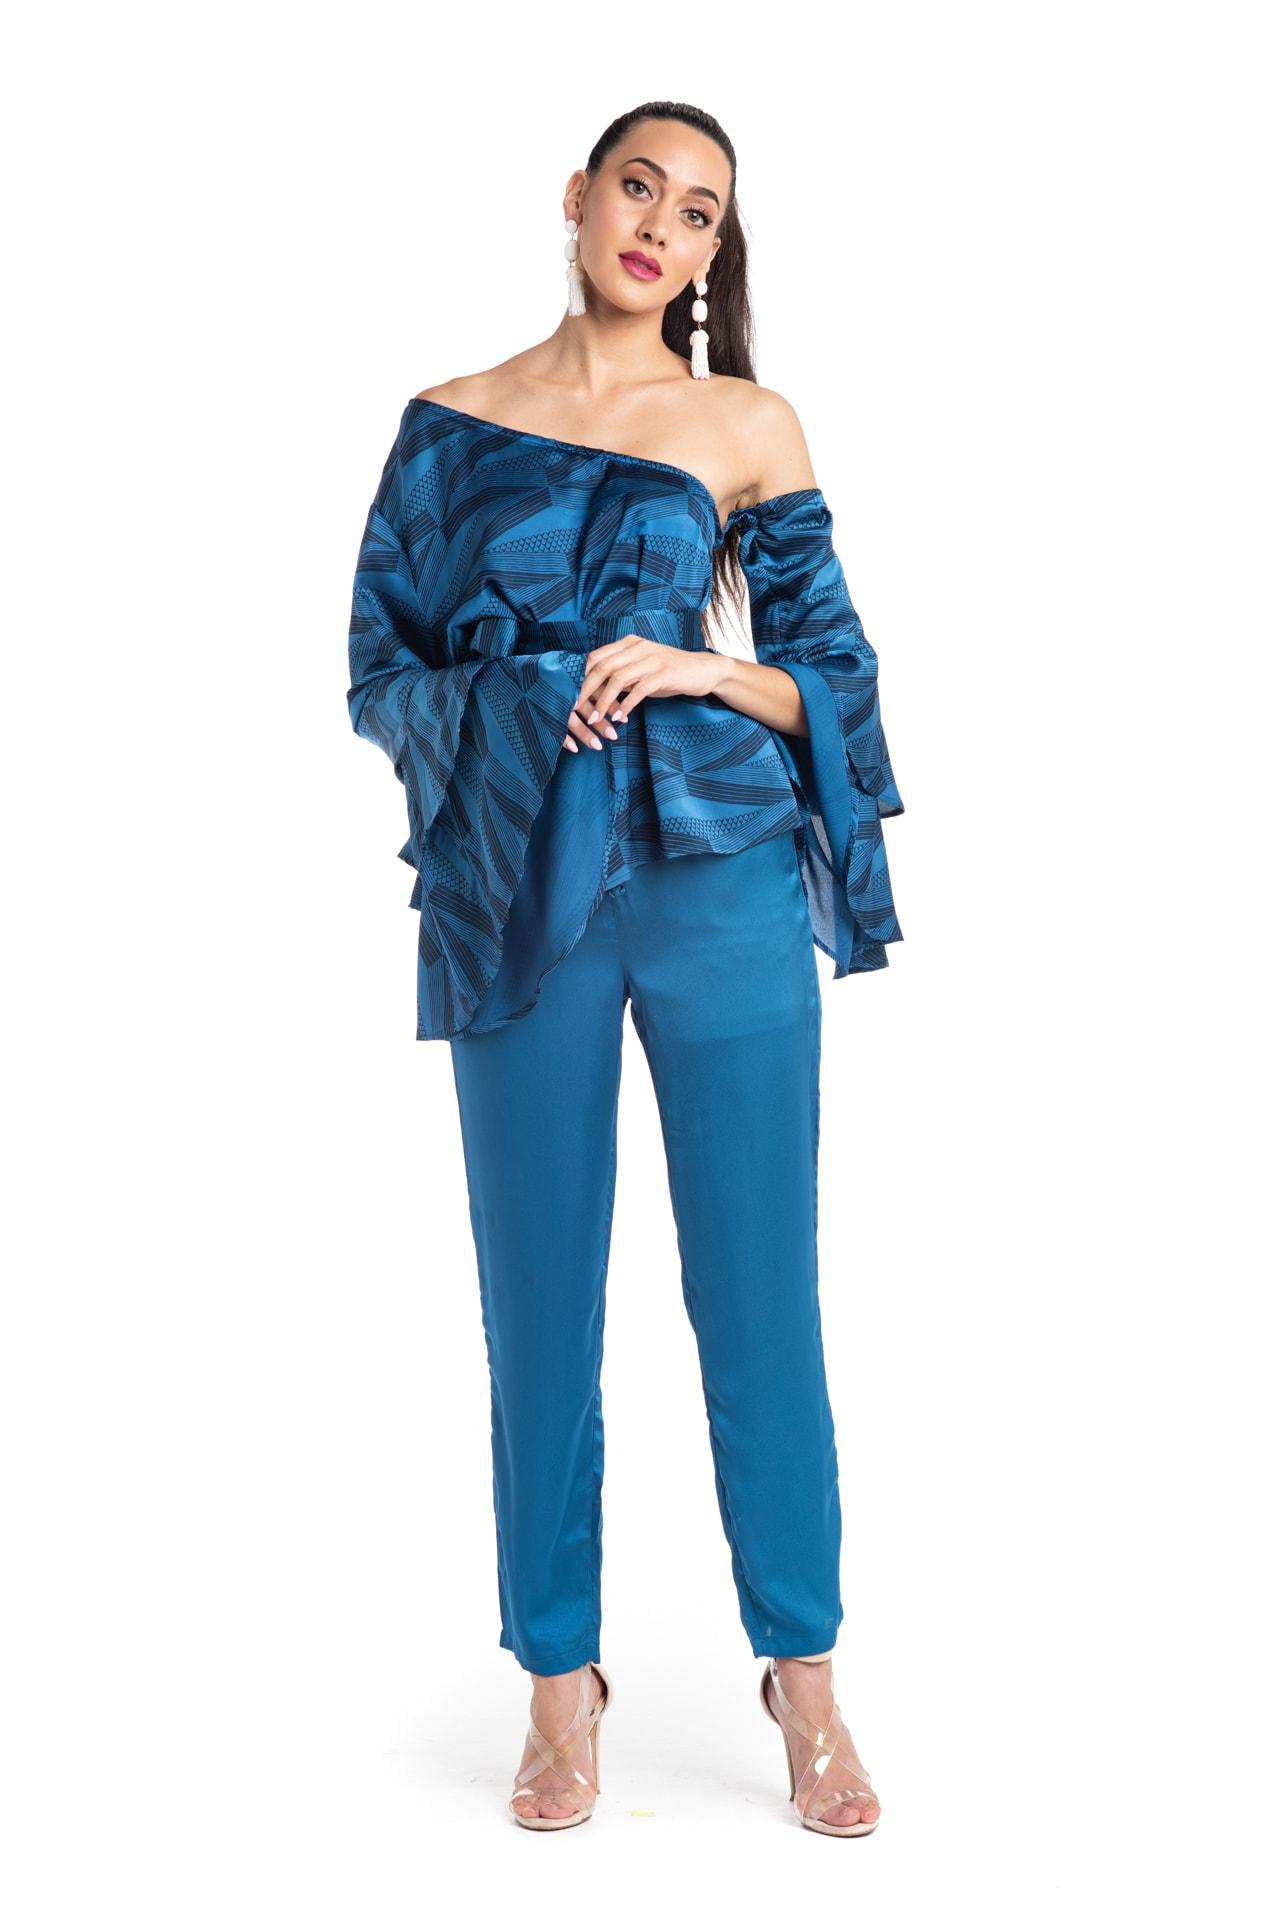 Model wearing Venus Top in Blue - Front View